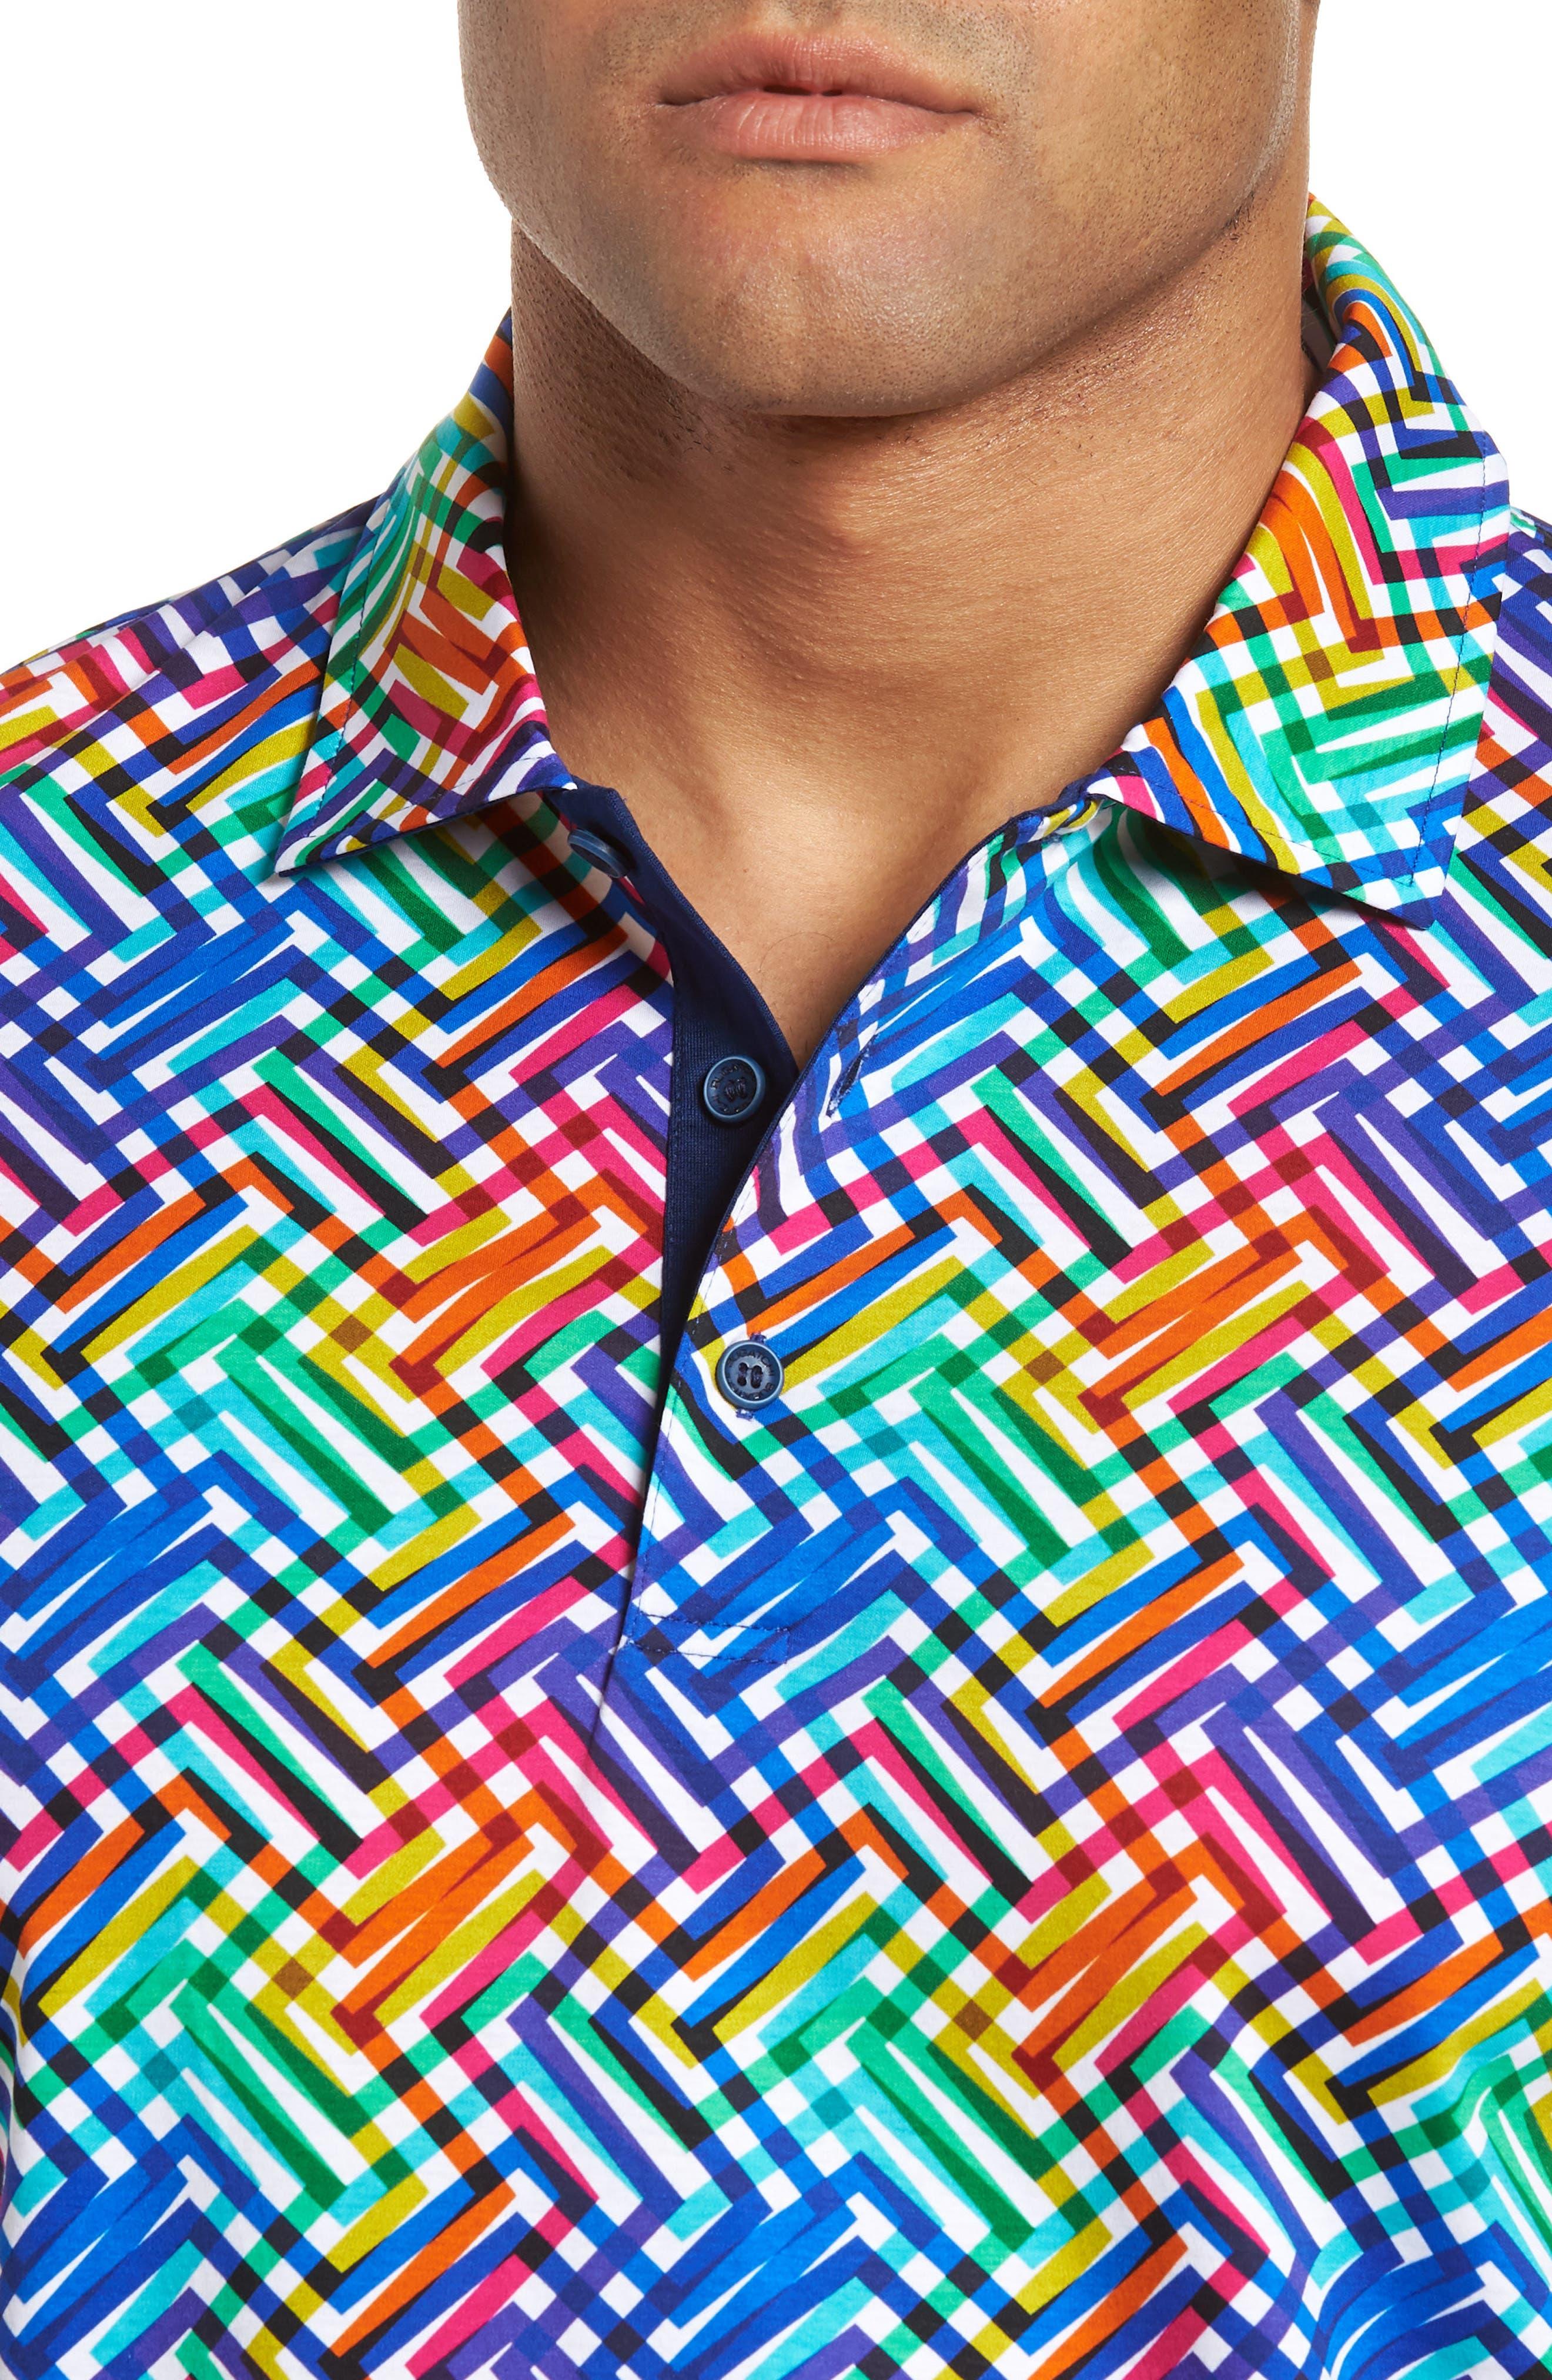 Regular Fit Knit Polo,                             Alternate thumbnail 4, color,                             601